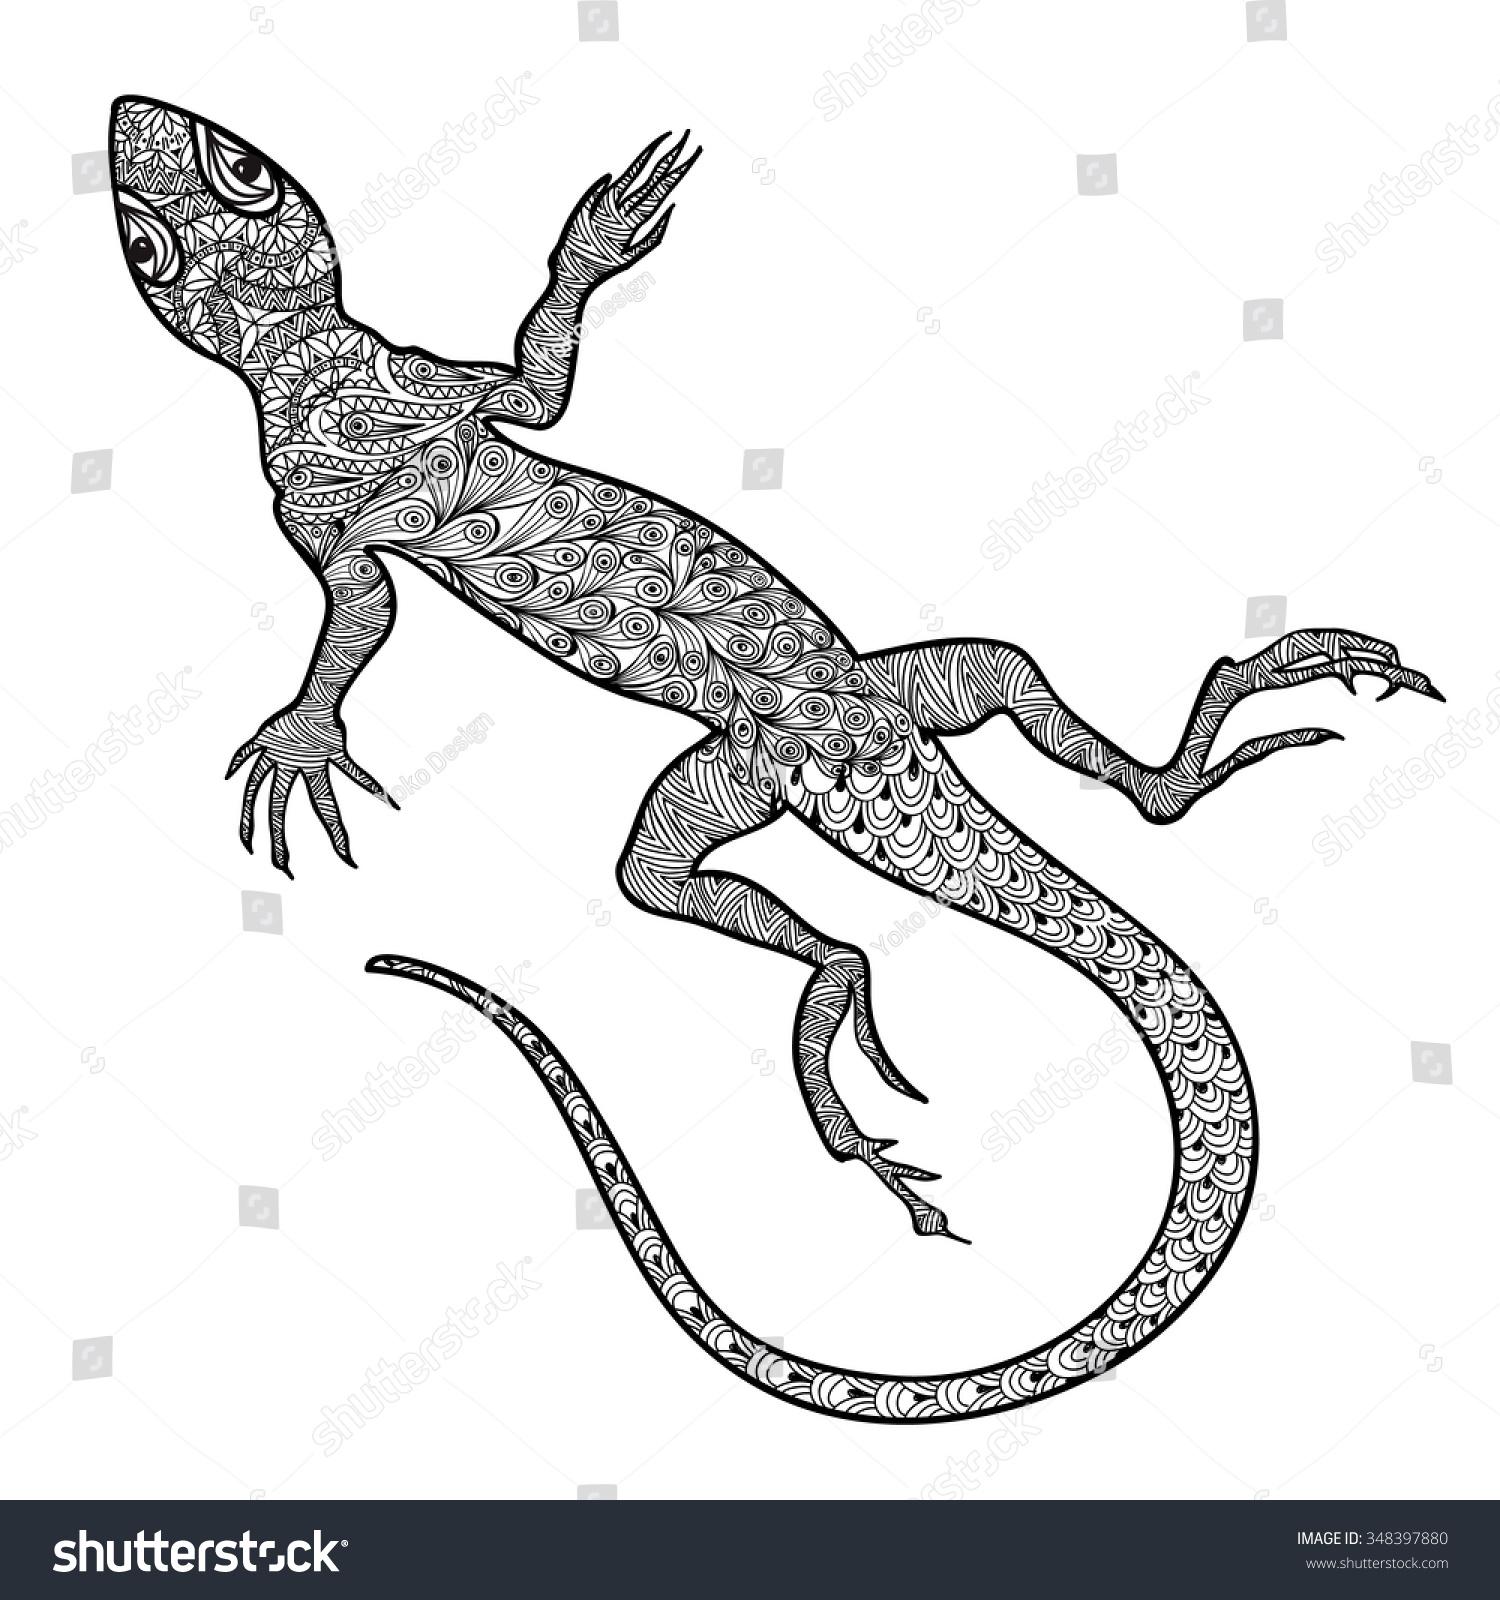 Lizard Reptile Isolated Patterned Ornamental Salamander Stock ...